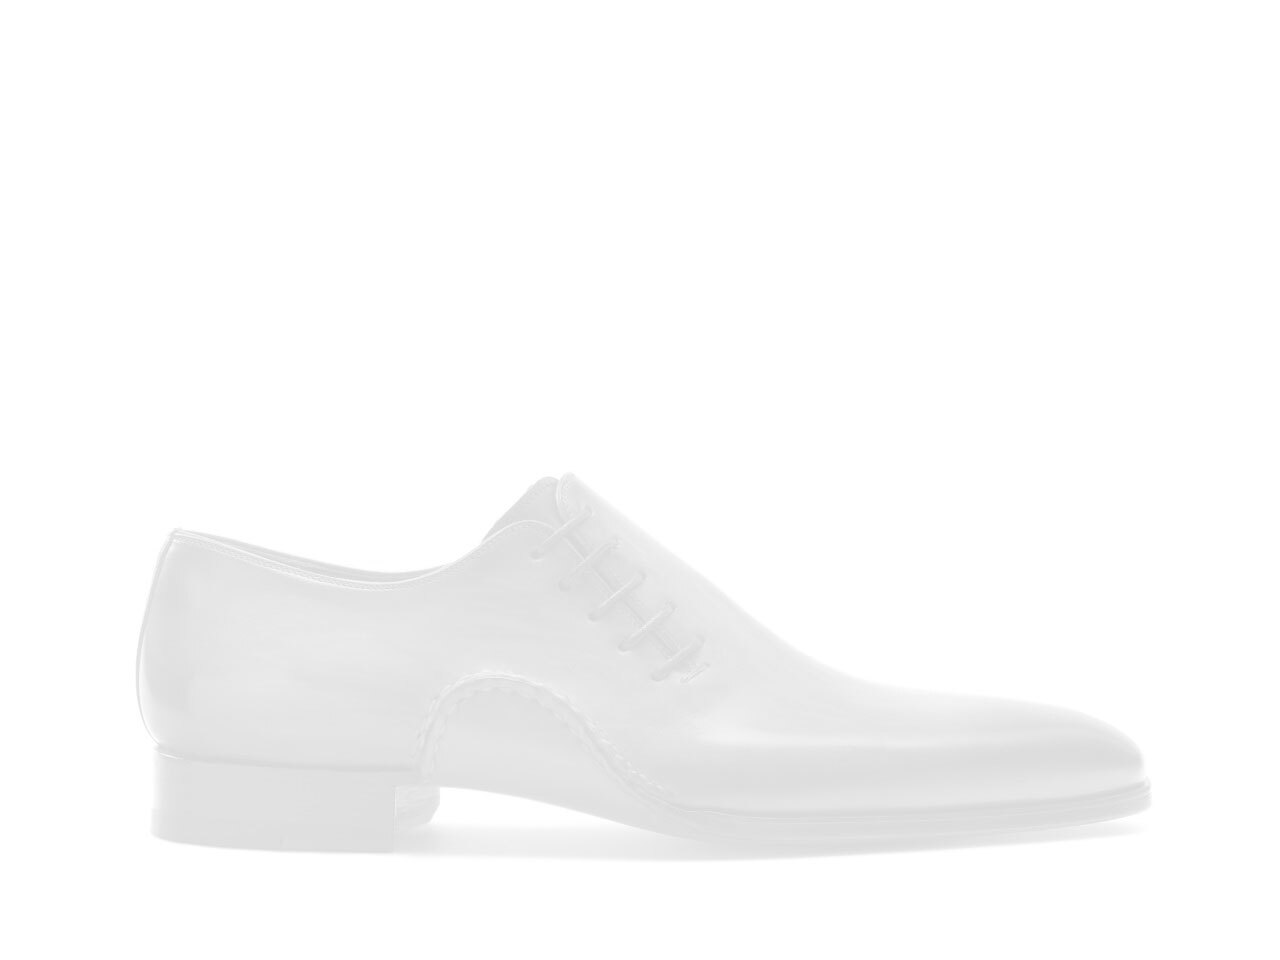 Sole of the Magnanni Turo Lo Grey Men's Sneakers